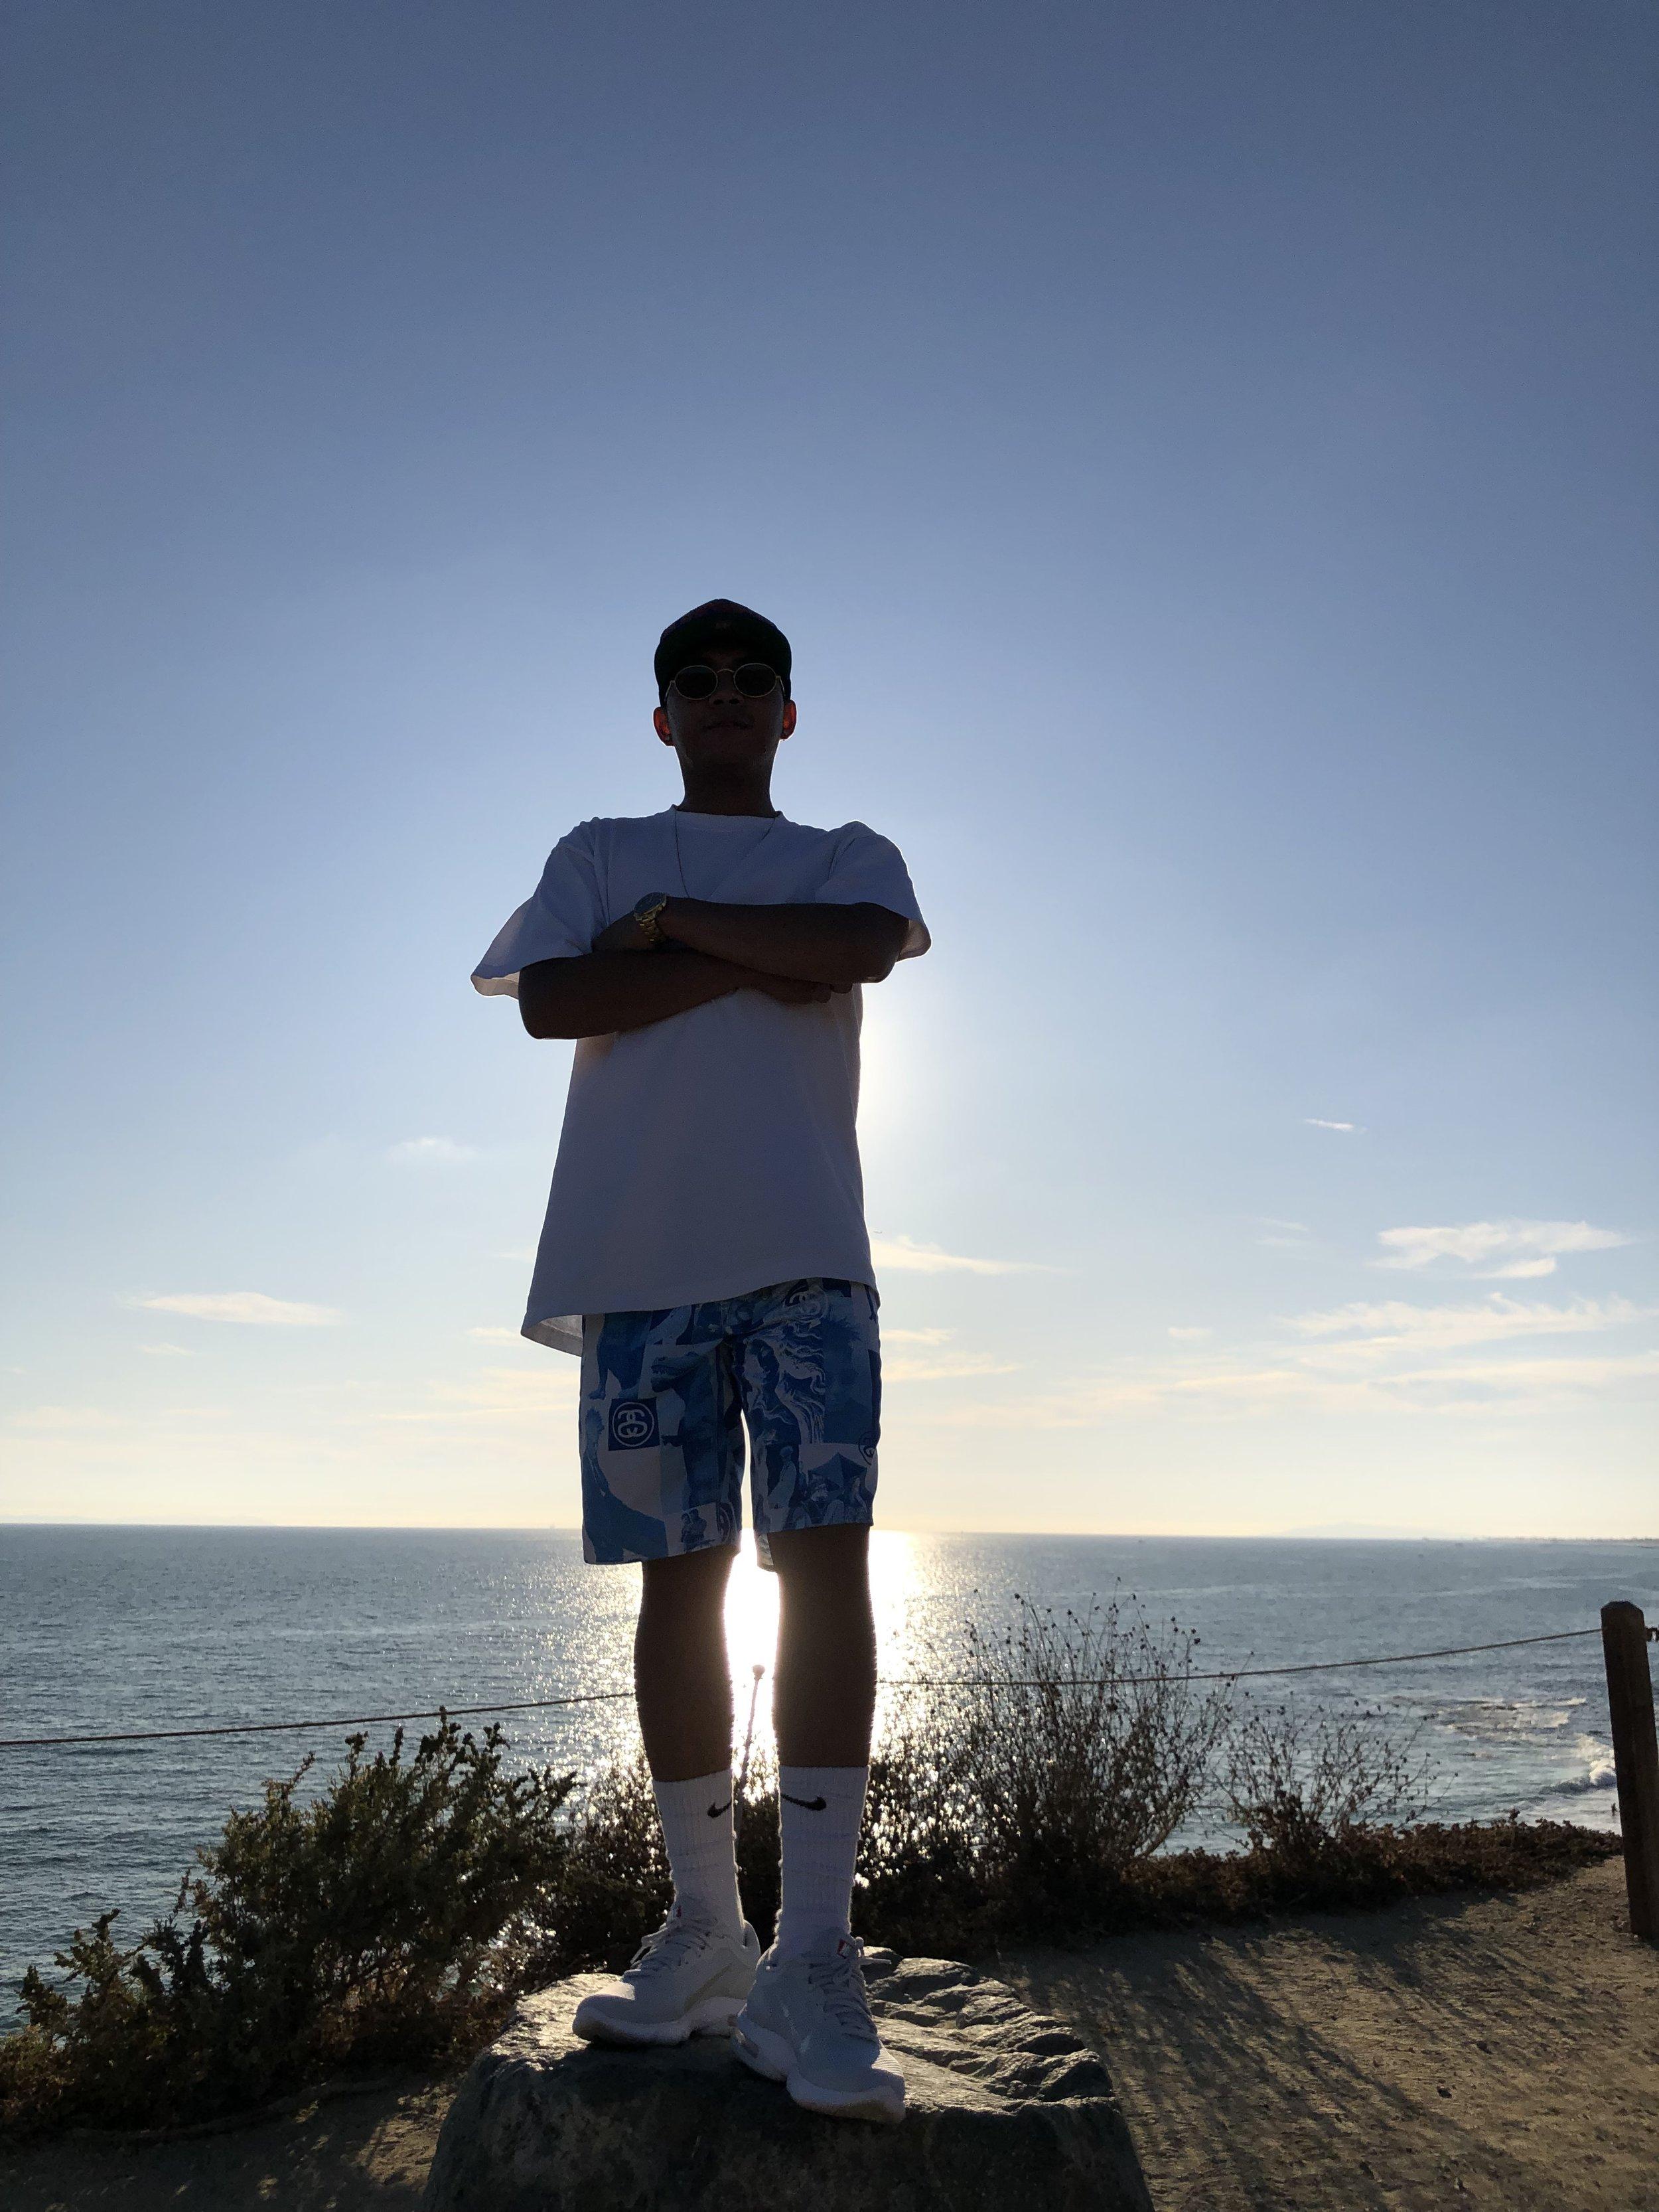 LOCATION: Crystal Cove - Newport Beach, CA